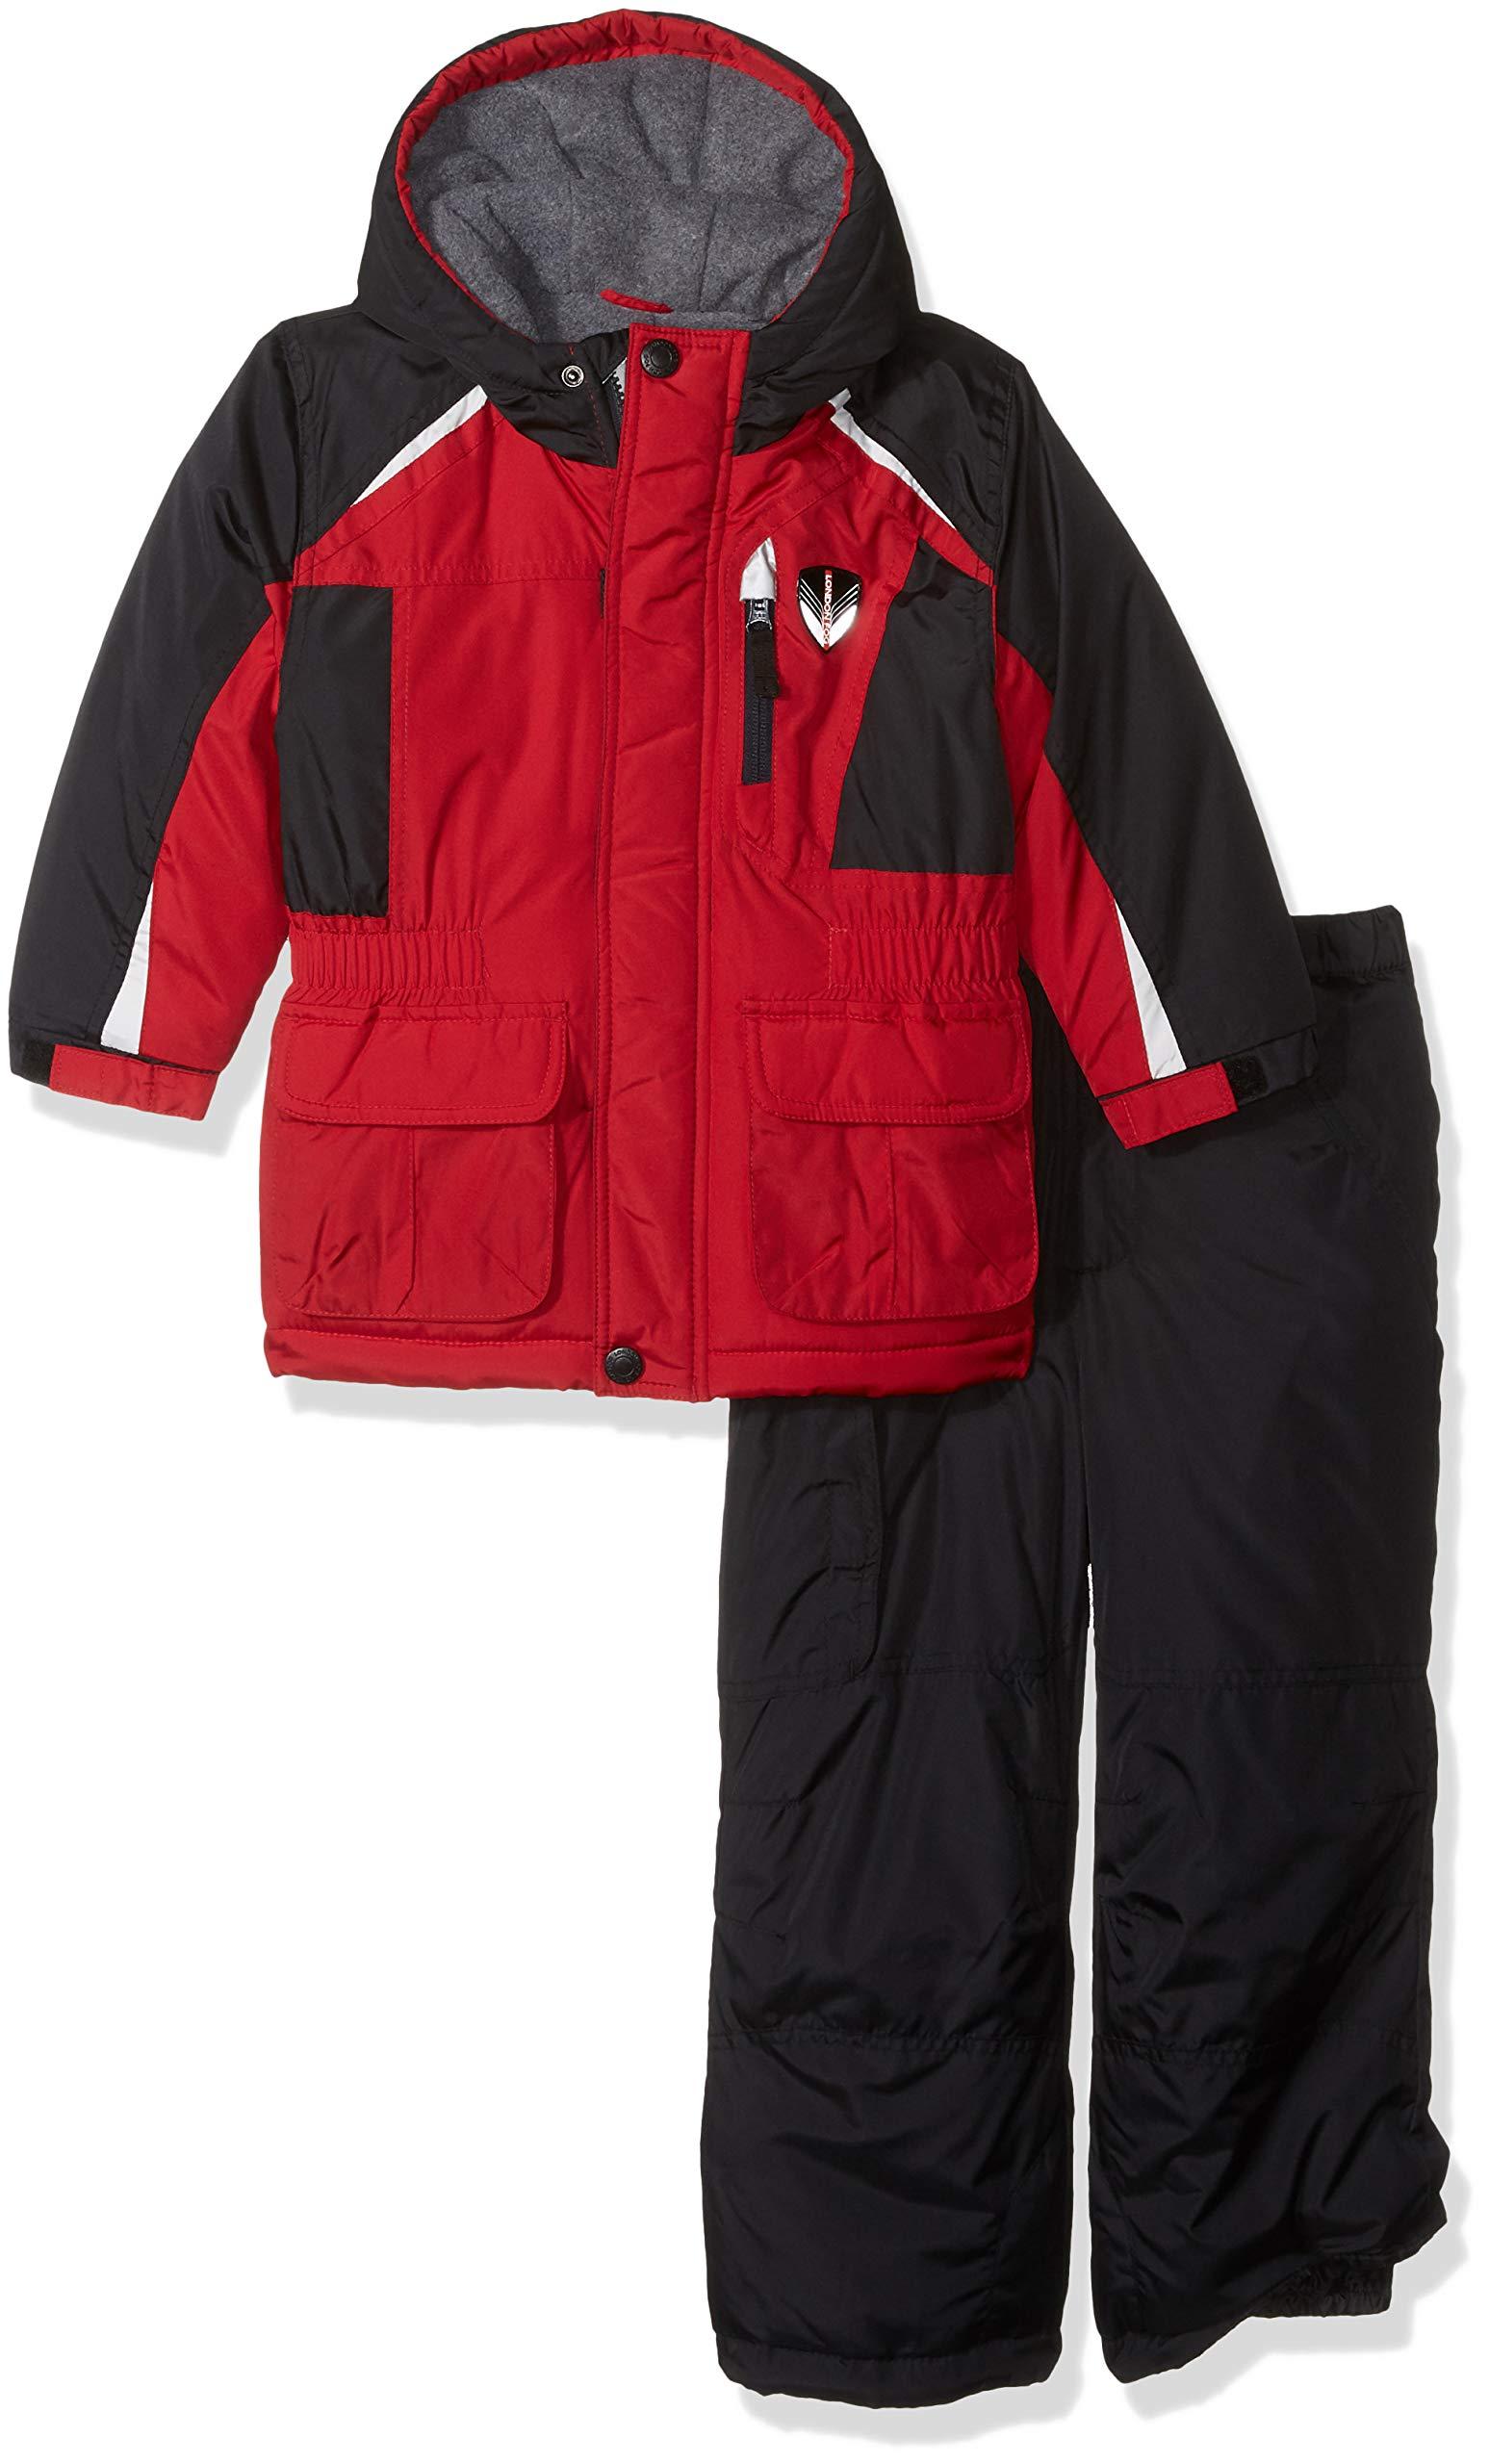 London Fog Boys' Little Ski Jacket & Ski Pant 2-Piece Snowsuit, Real red, 4 by London Fog